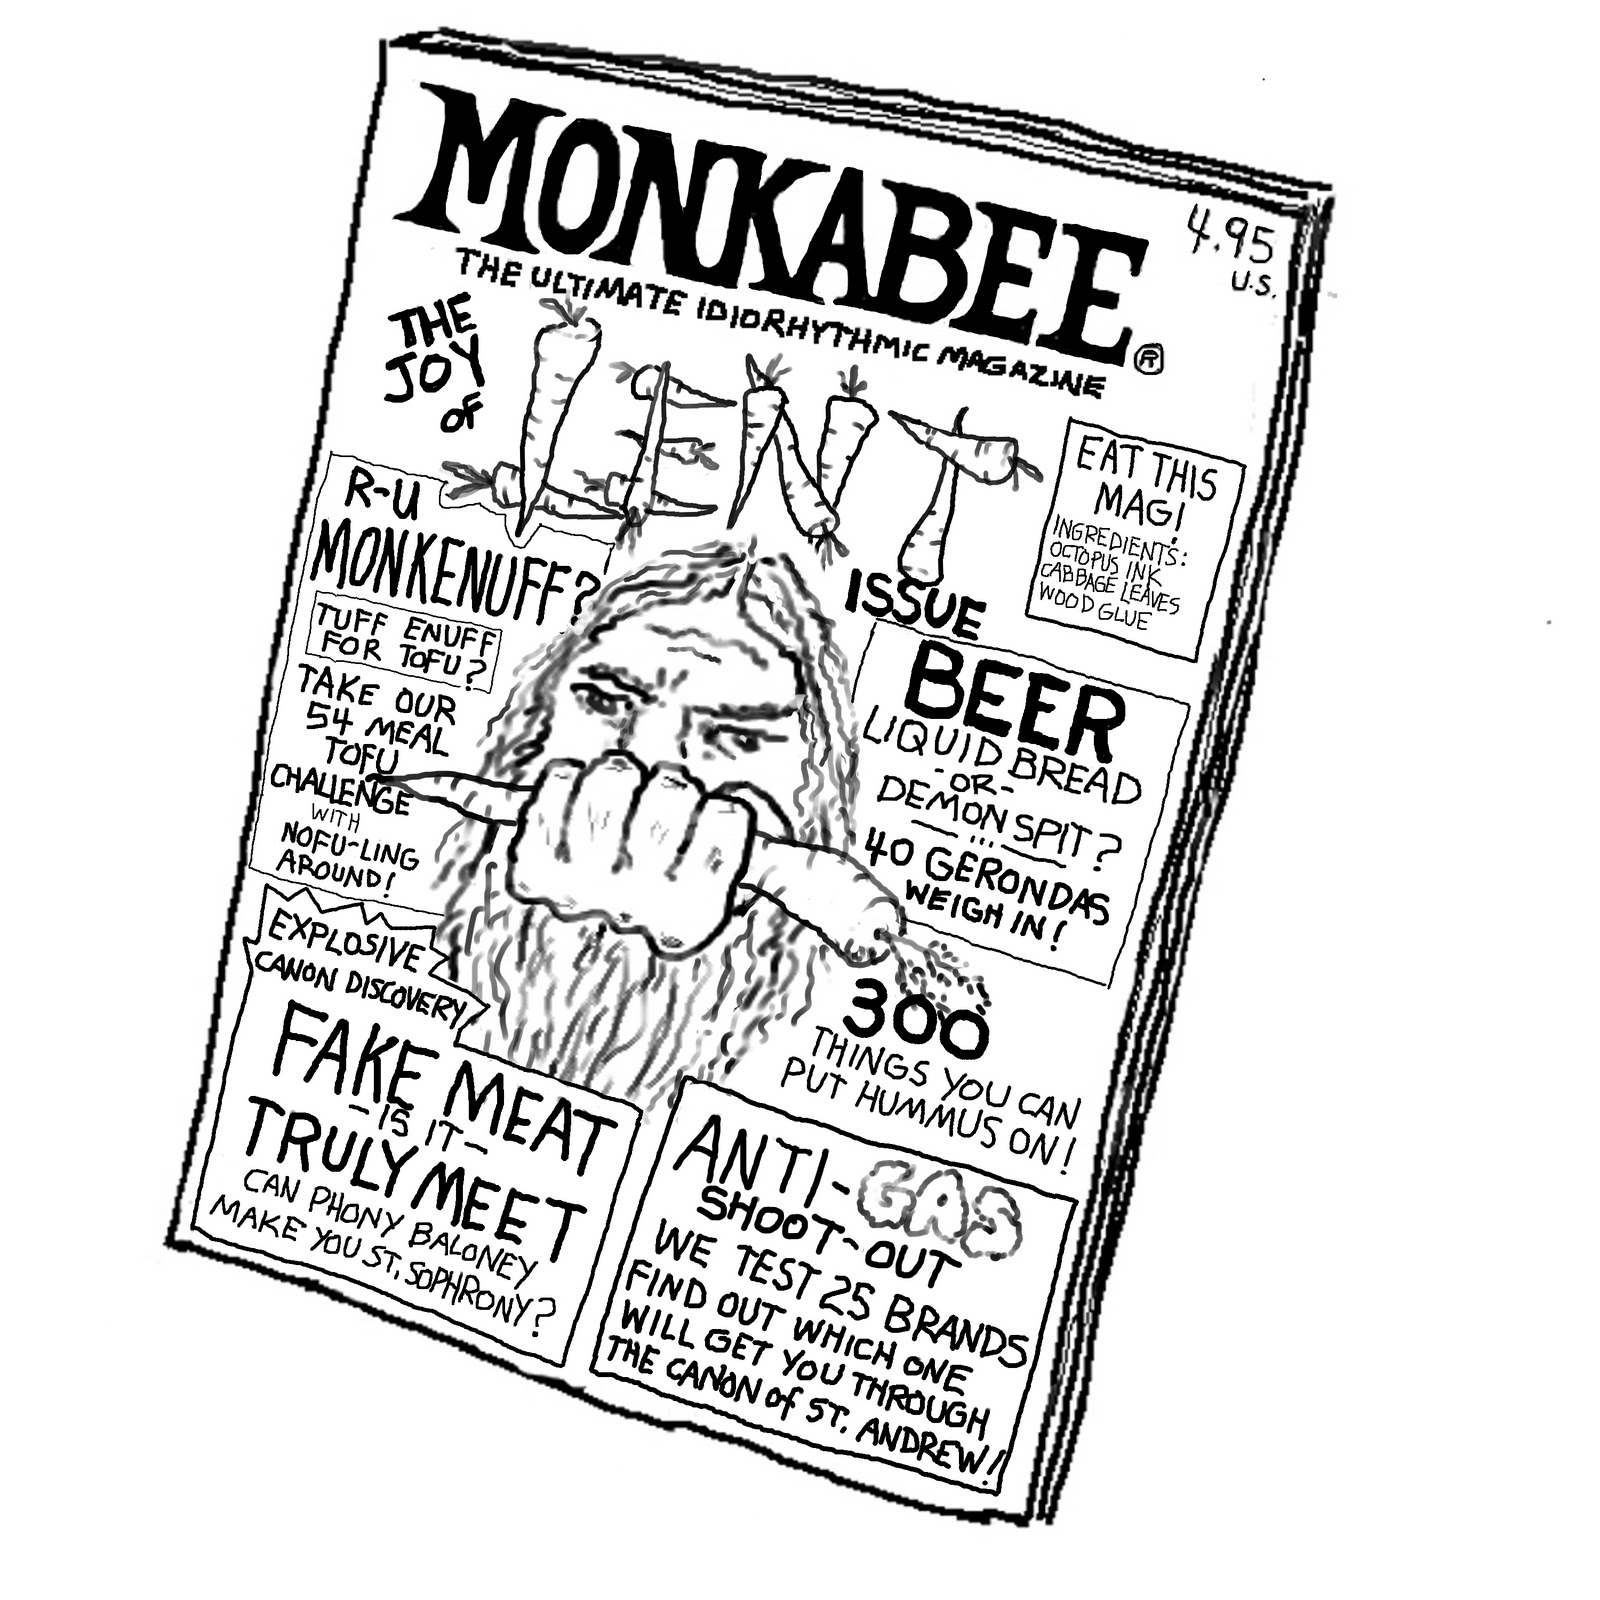 pithless thoughts monkabee magazine 6 Ringing Bell Diagram monkabee magazine 6